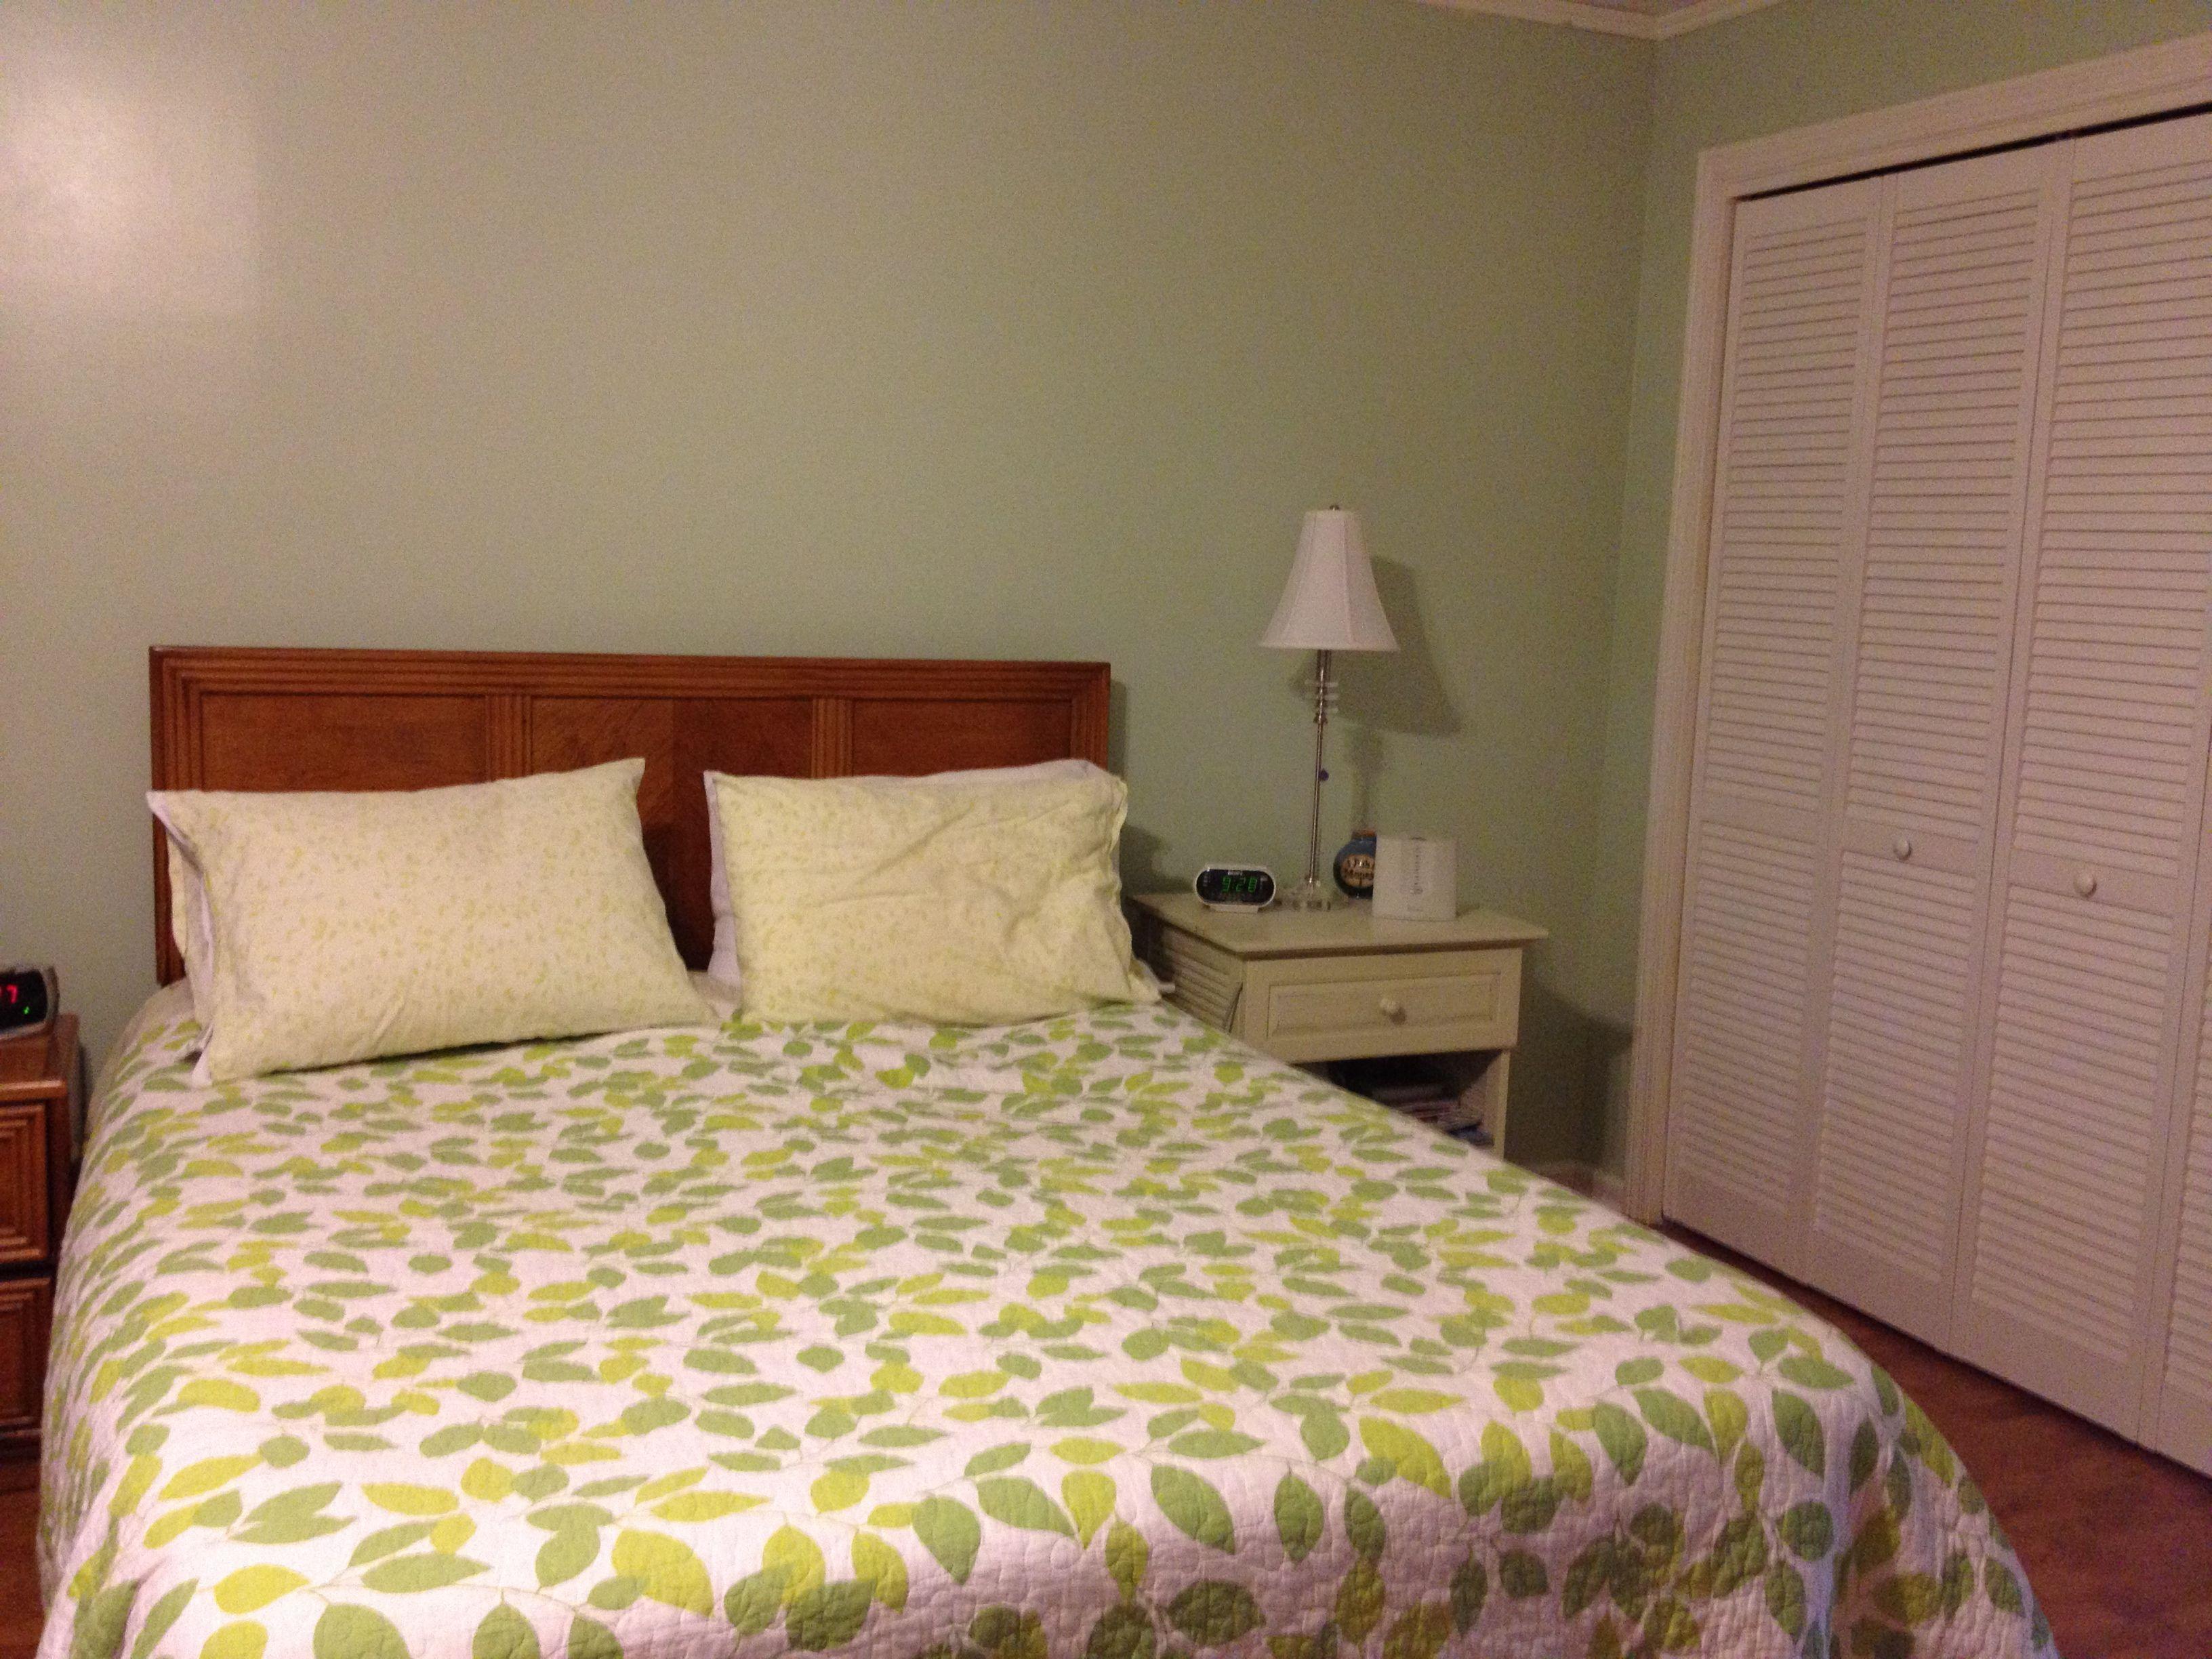 nice clean green for bedroom walls